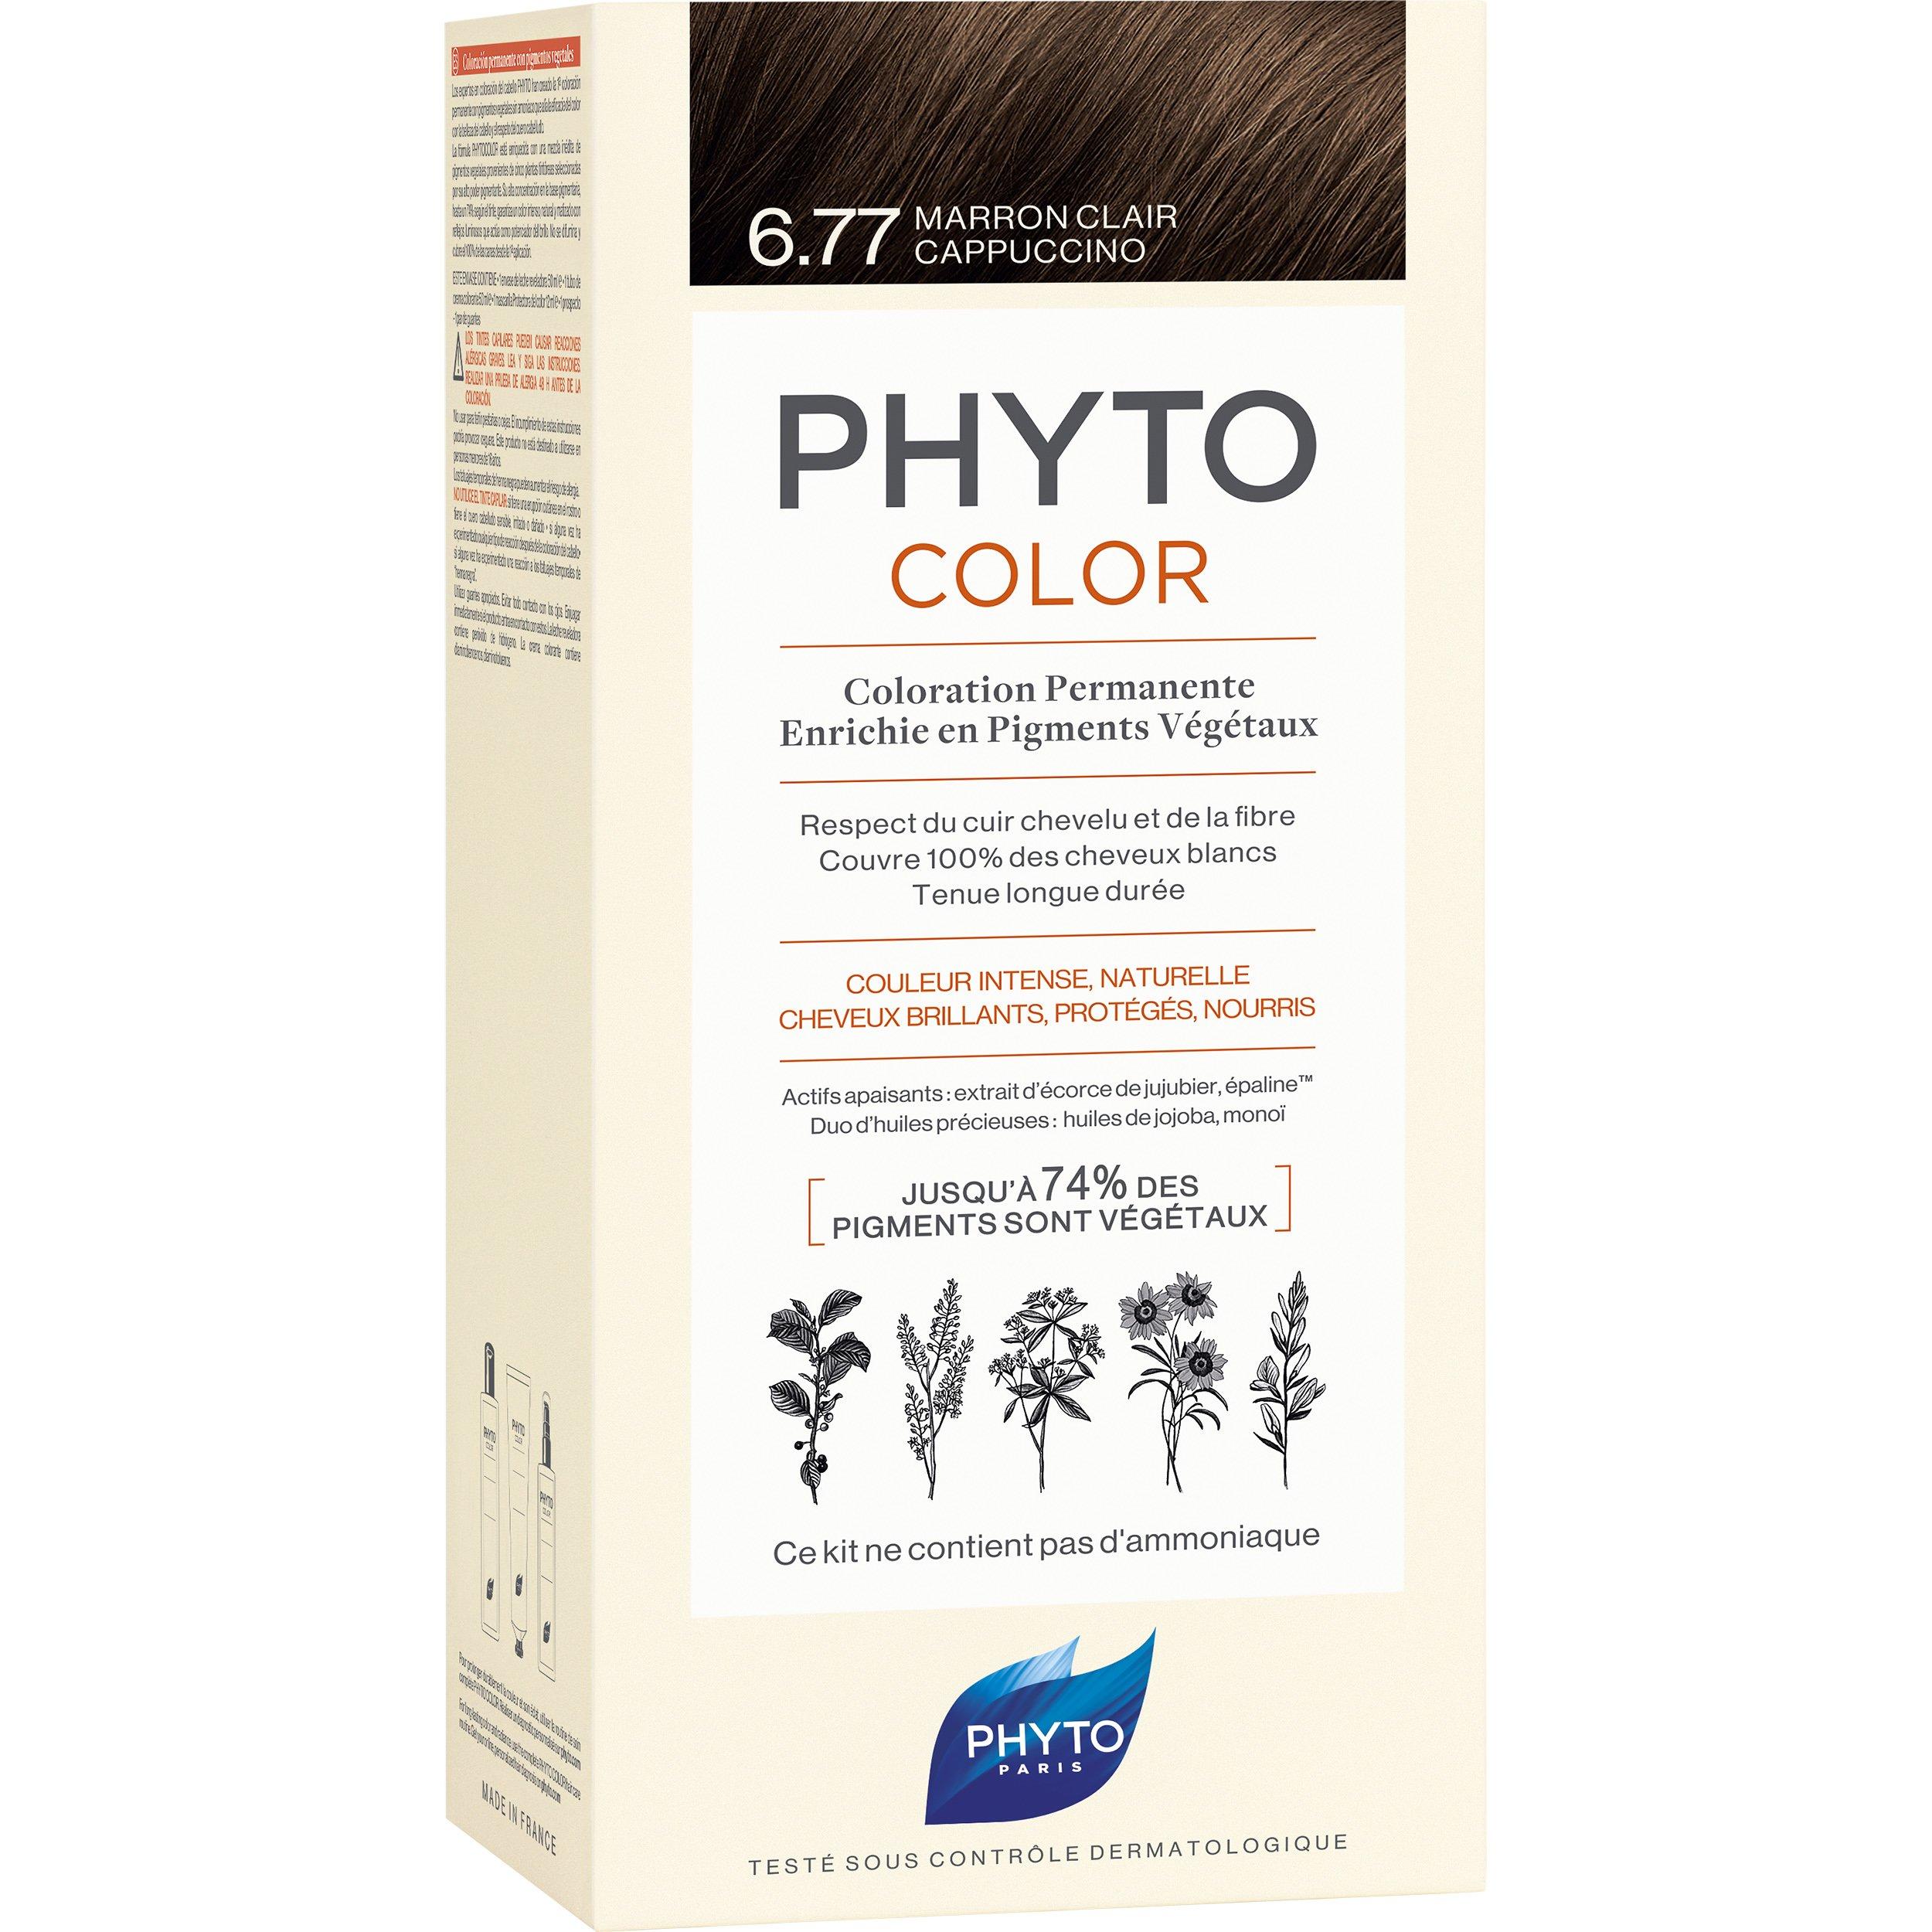 Phyto PhytoColor Coloration Permanente η No1 Μόνιμη Βαφή Μαλλιών Χωρίς Χρωστικές Ουσίες & Αμμωνία – 6.77 Μαρόν Ανοιχτό Καπουτσίνο